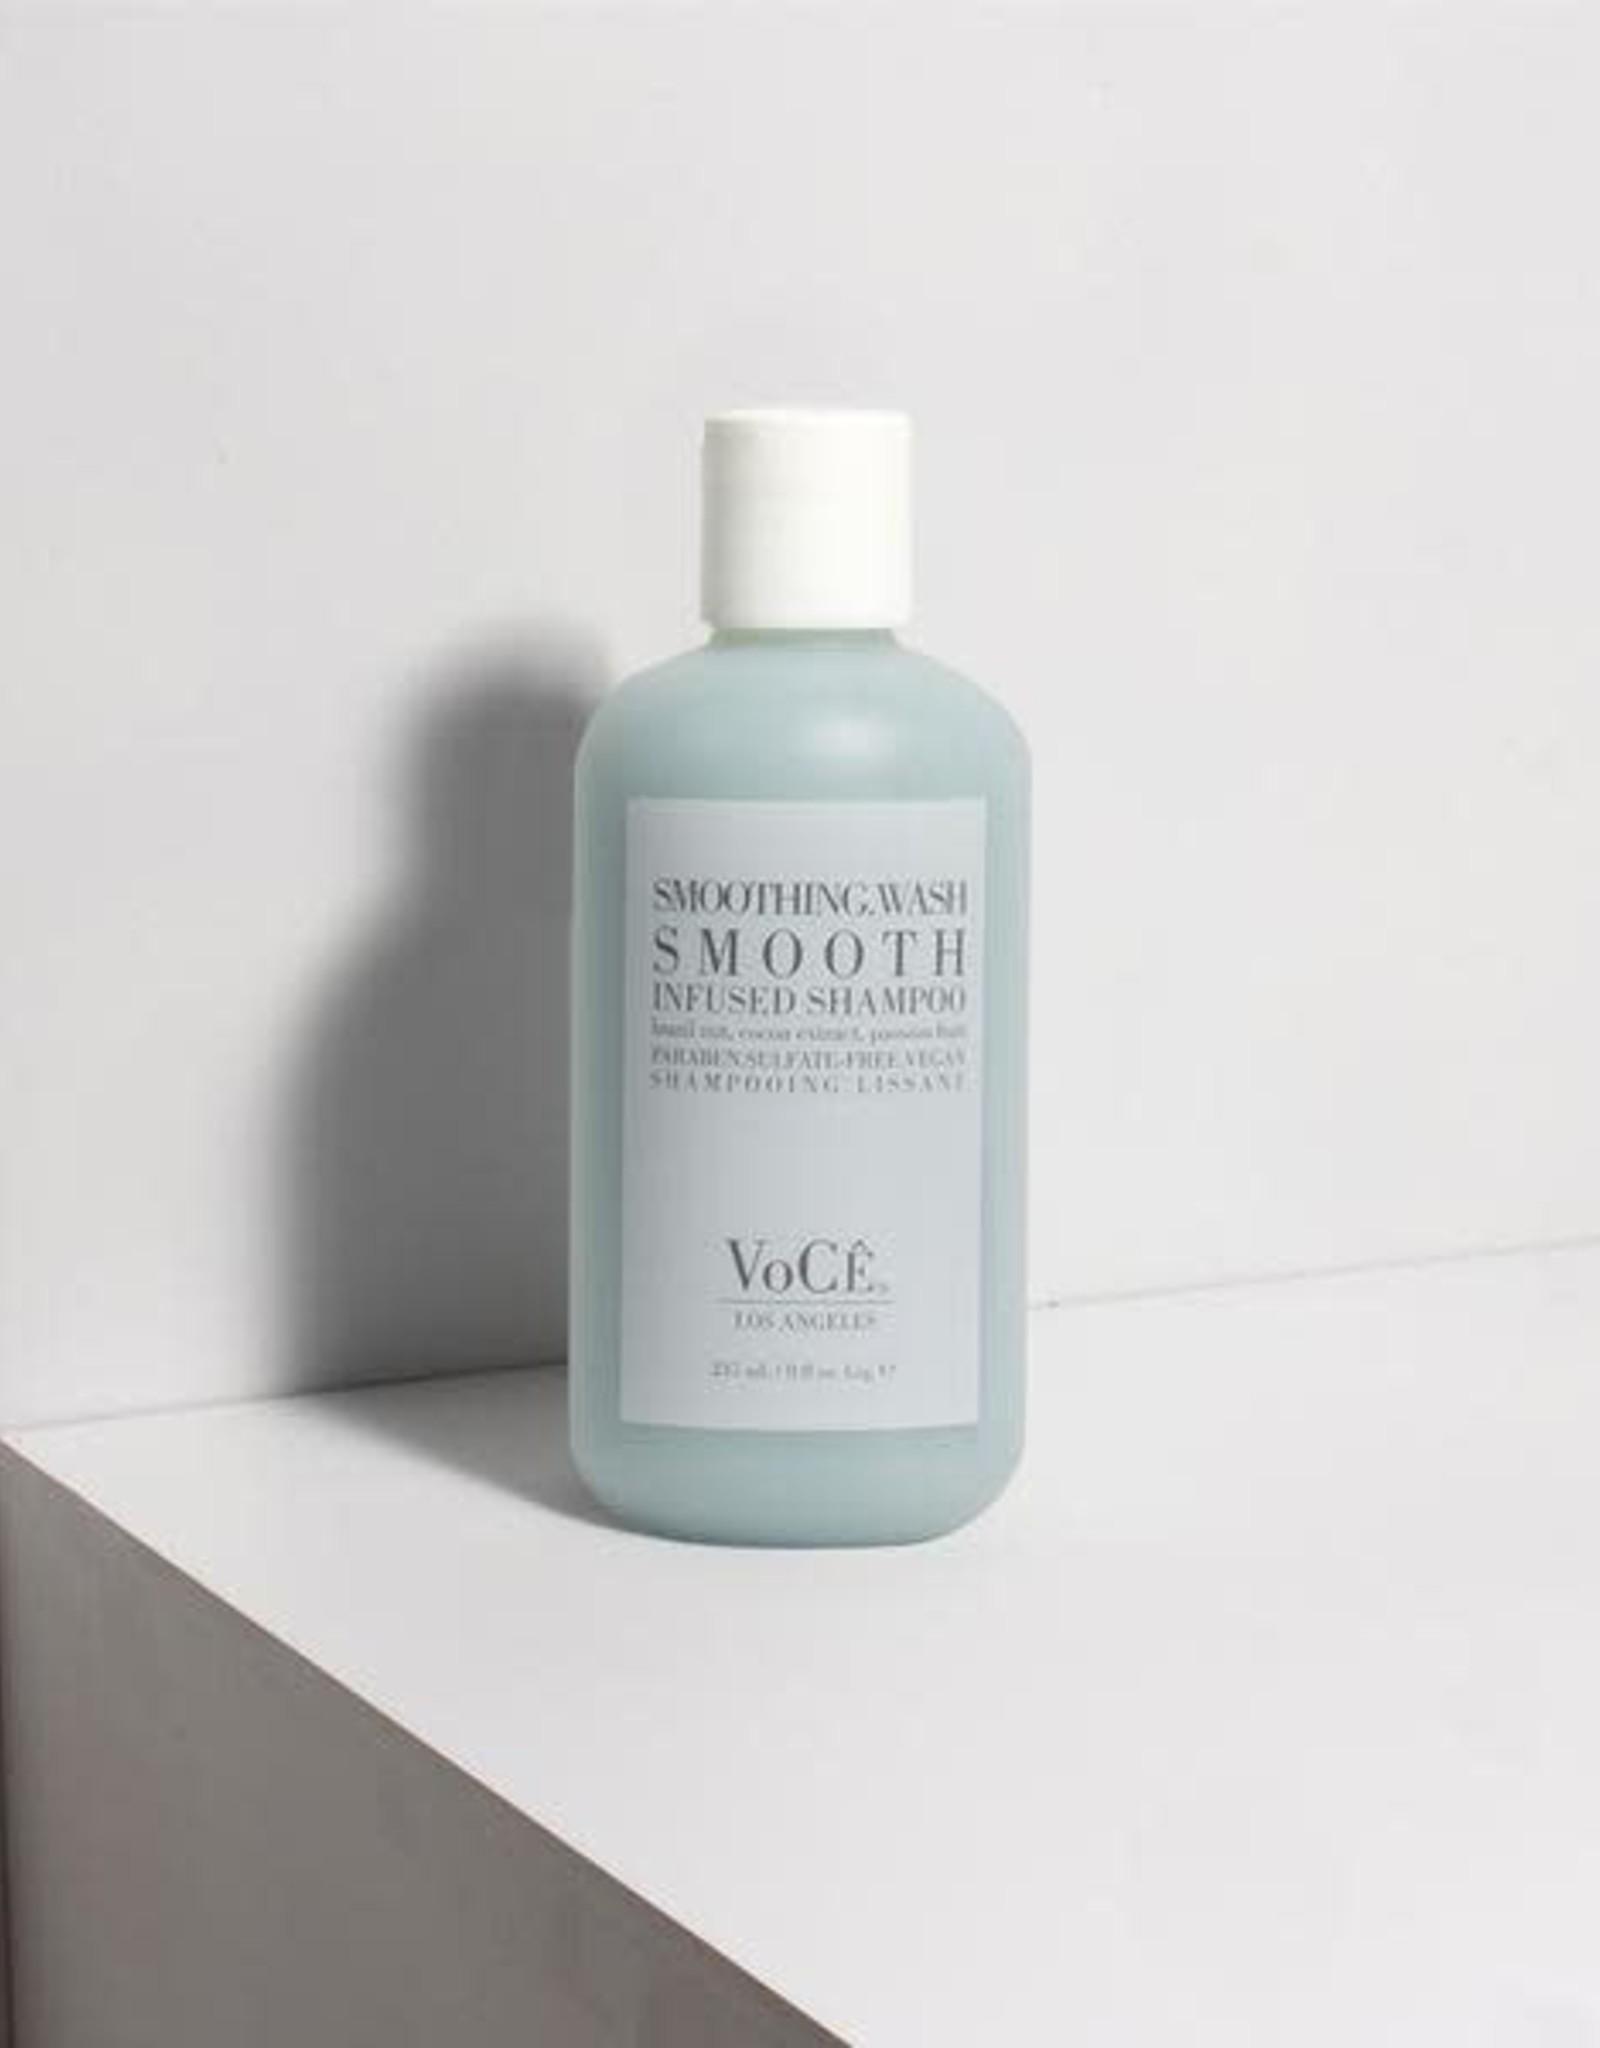 Voce Smoothing Wash